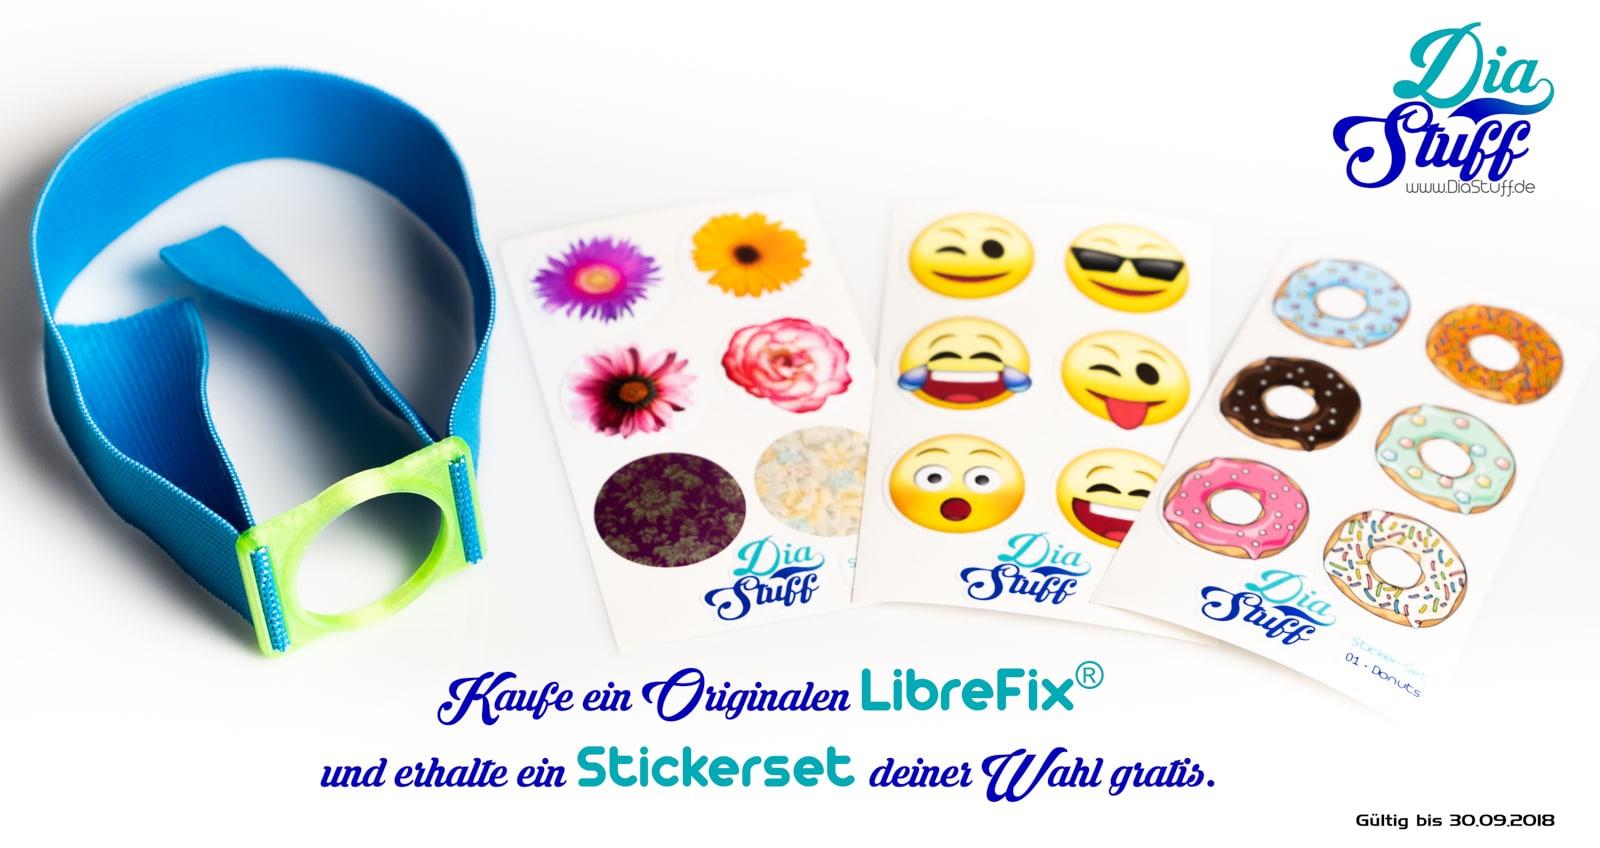 Freestyle Libre Sticker Set Gratis